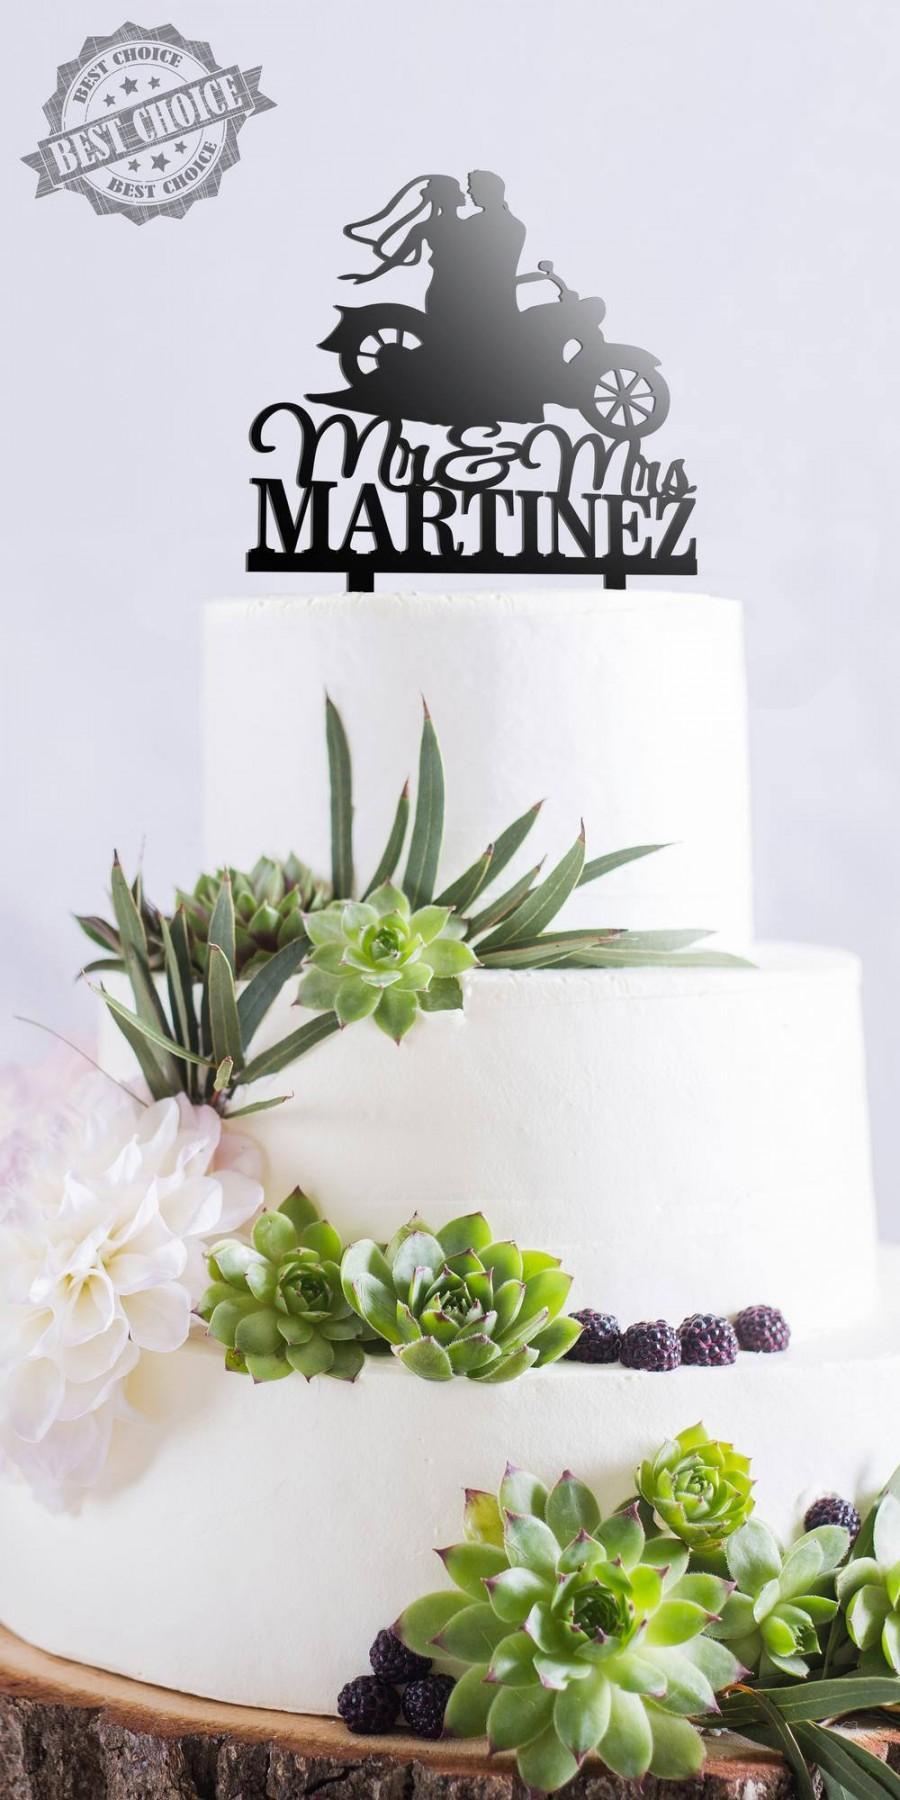 Свадьба - Personalized Wedding Cake Topper Customized Wedding Cake Topper With Bike Motorcycle Cake Topper Personalized Last Name Cake Topper Bike D#5